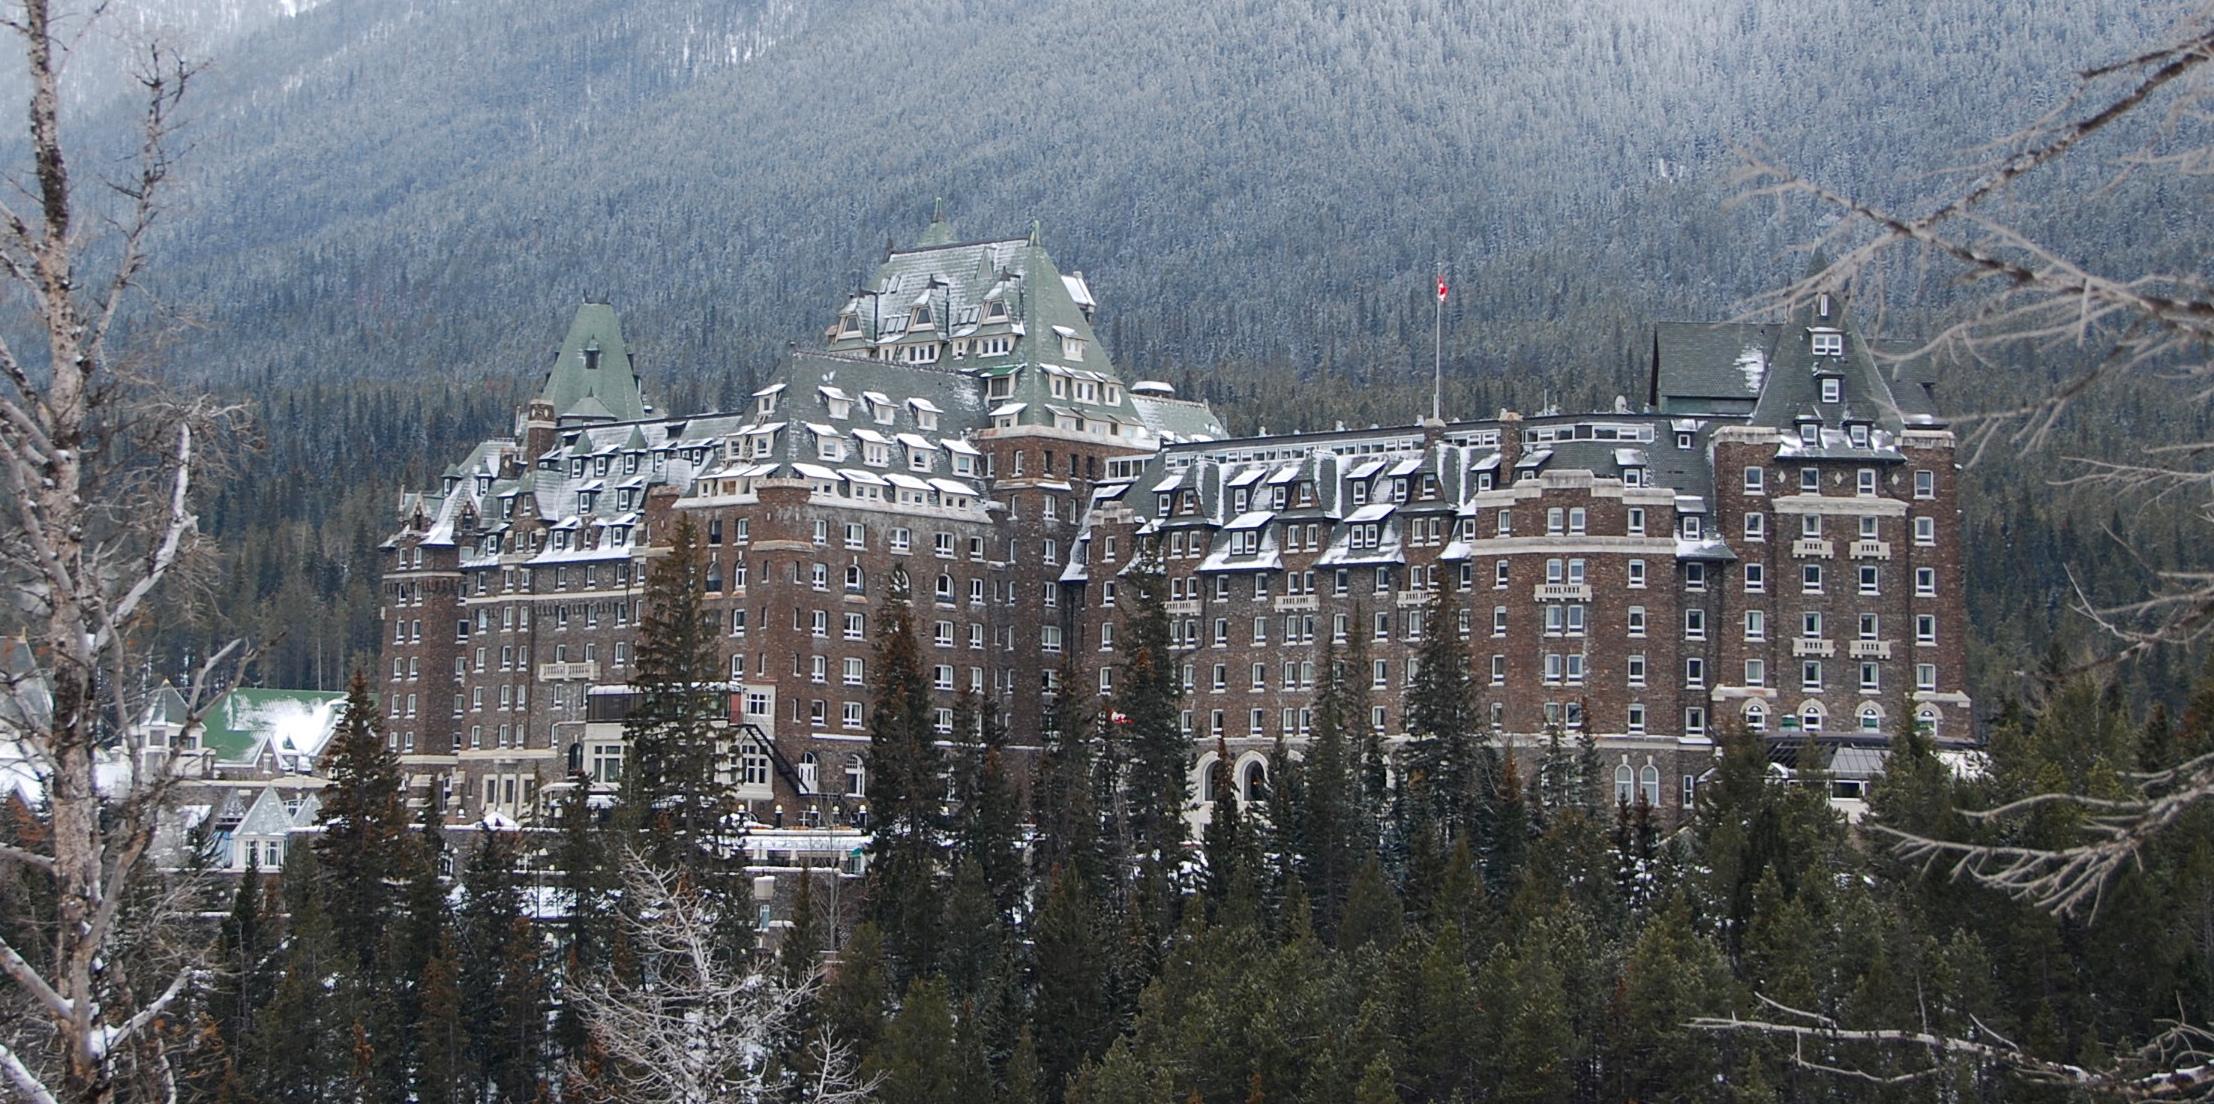 Banff-Springs-Hotel